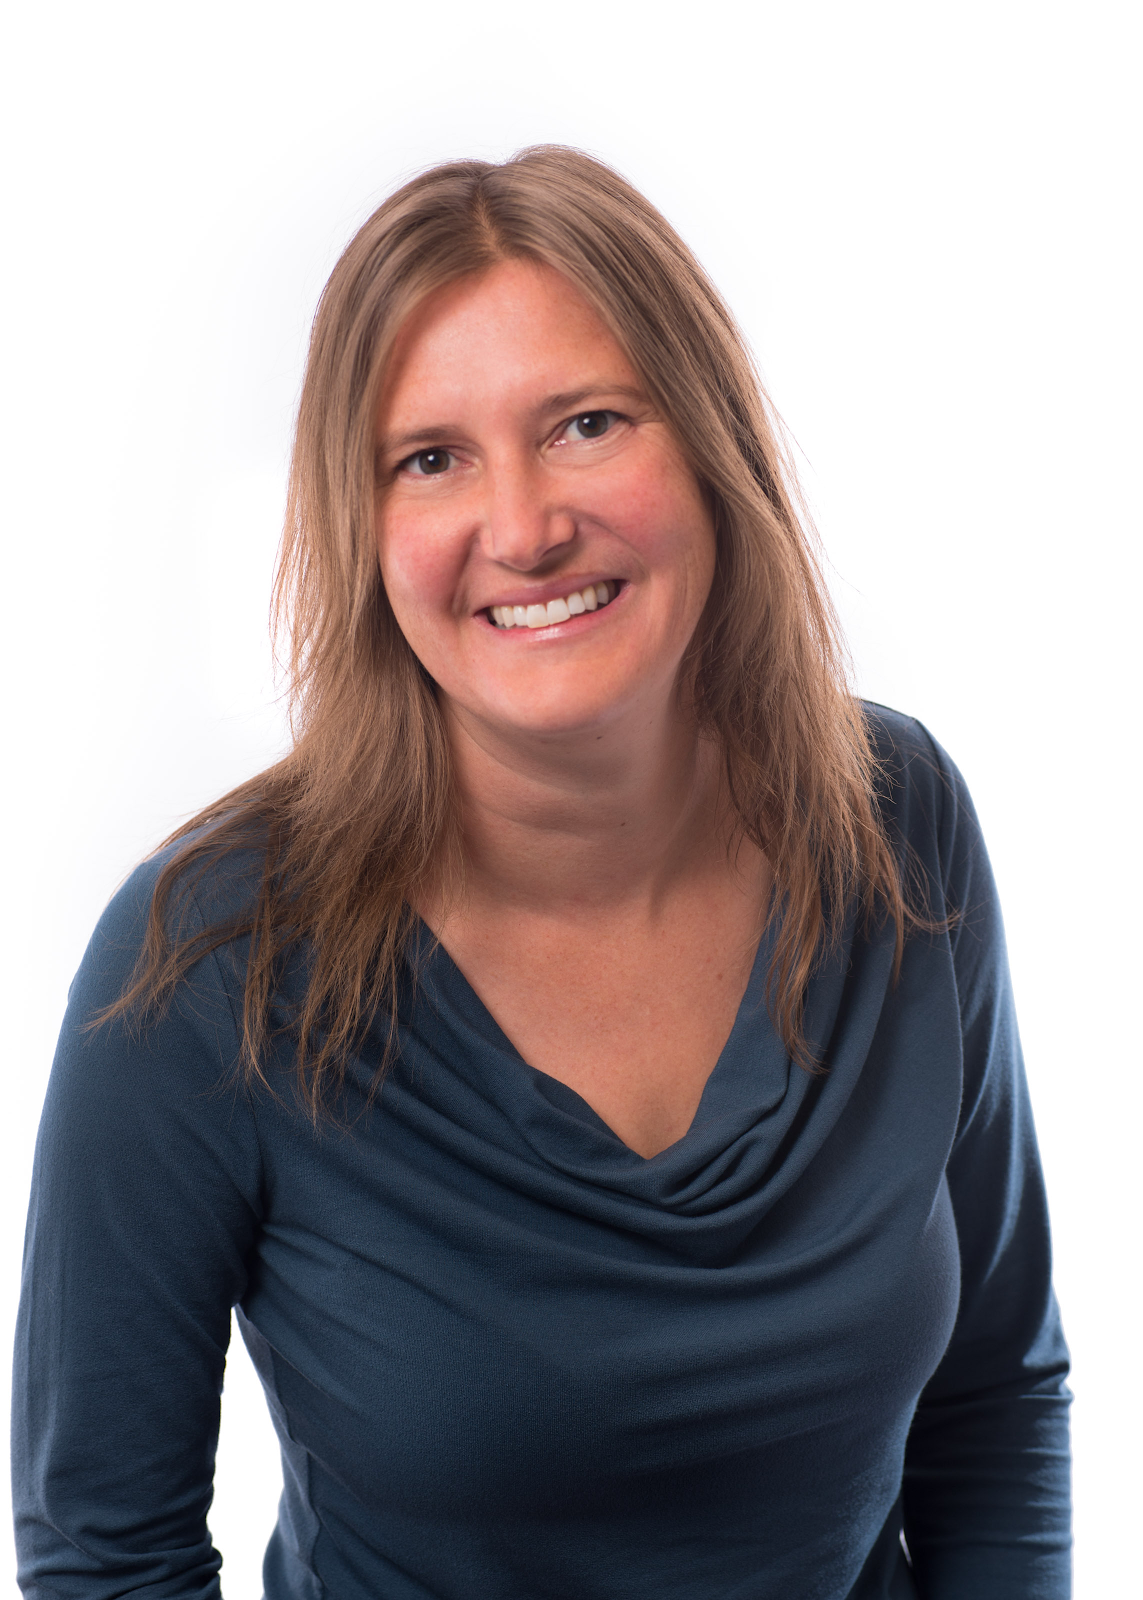 Dr. Amanda Malone - CSO, Eupraxia Pharmaceuticals